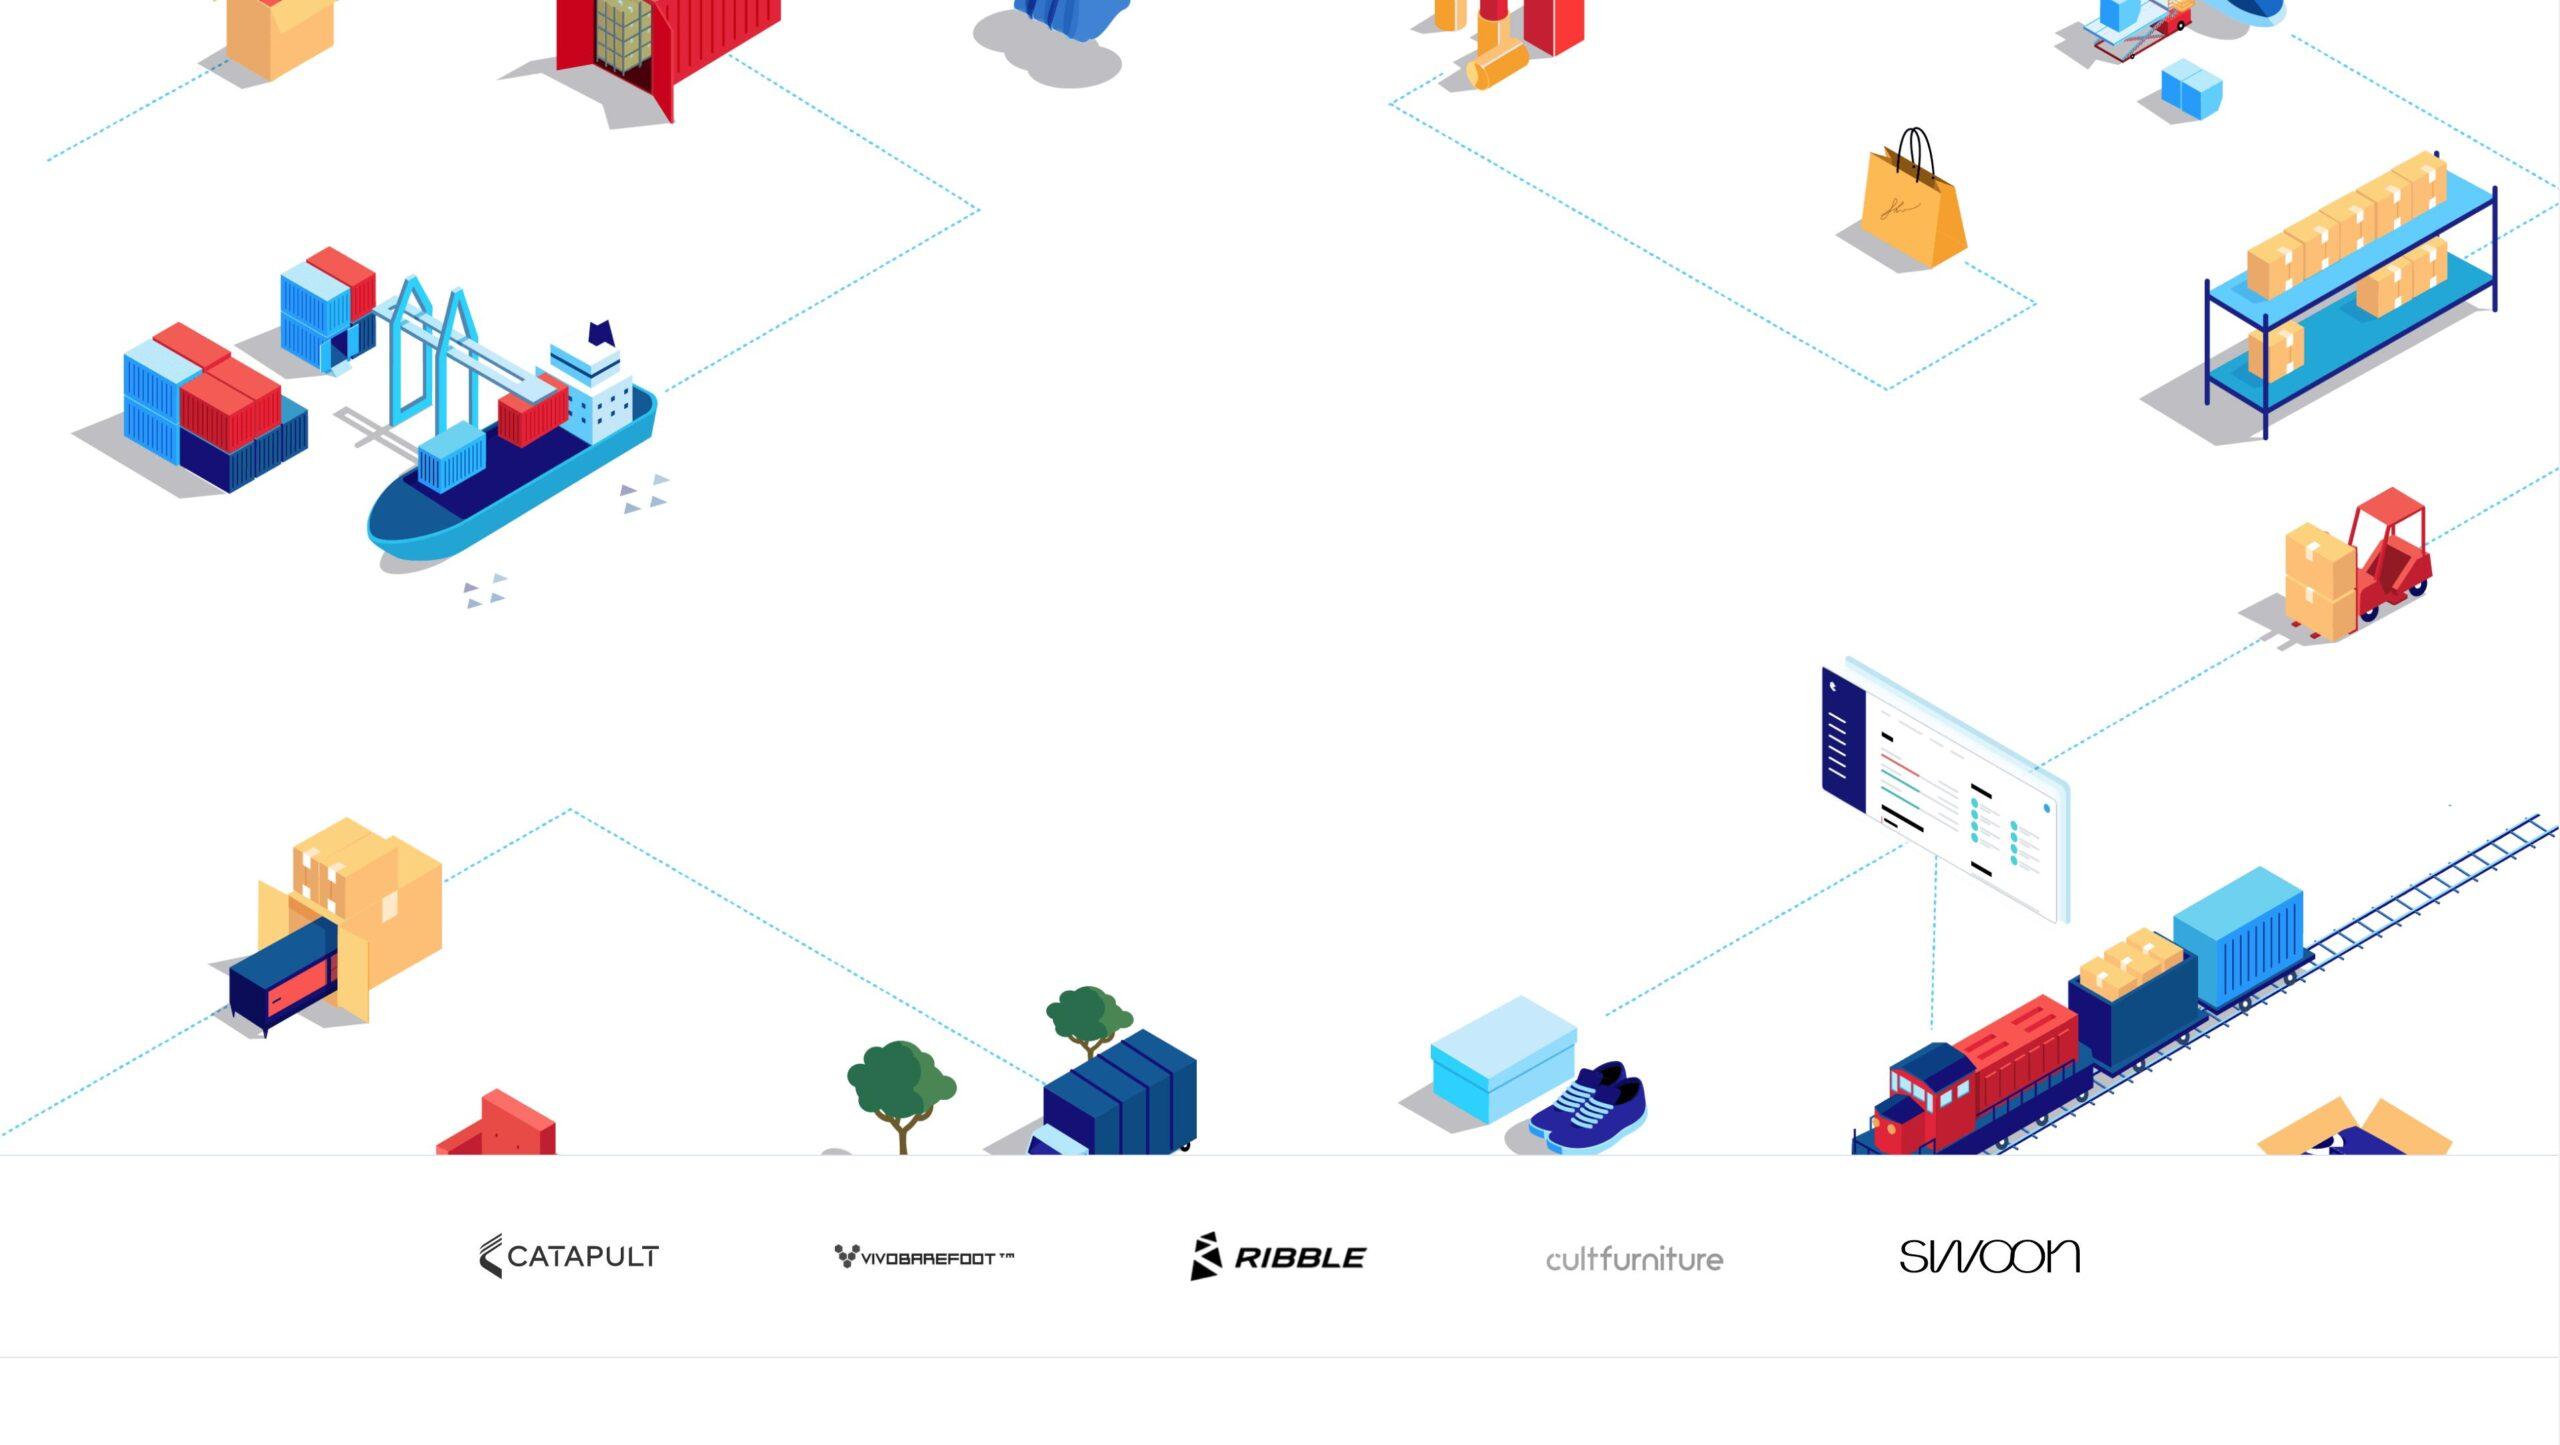 Orpetron Web Design Awards - Zencargo - Web Design Awards Inspiration Trends UI UX